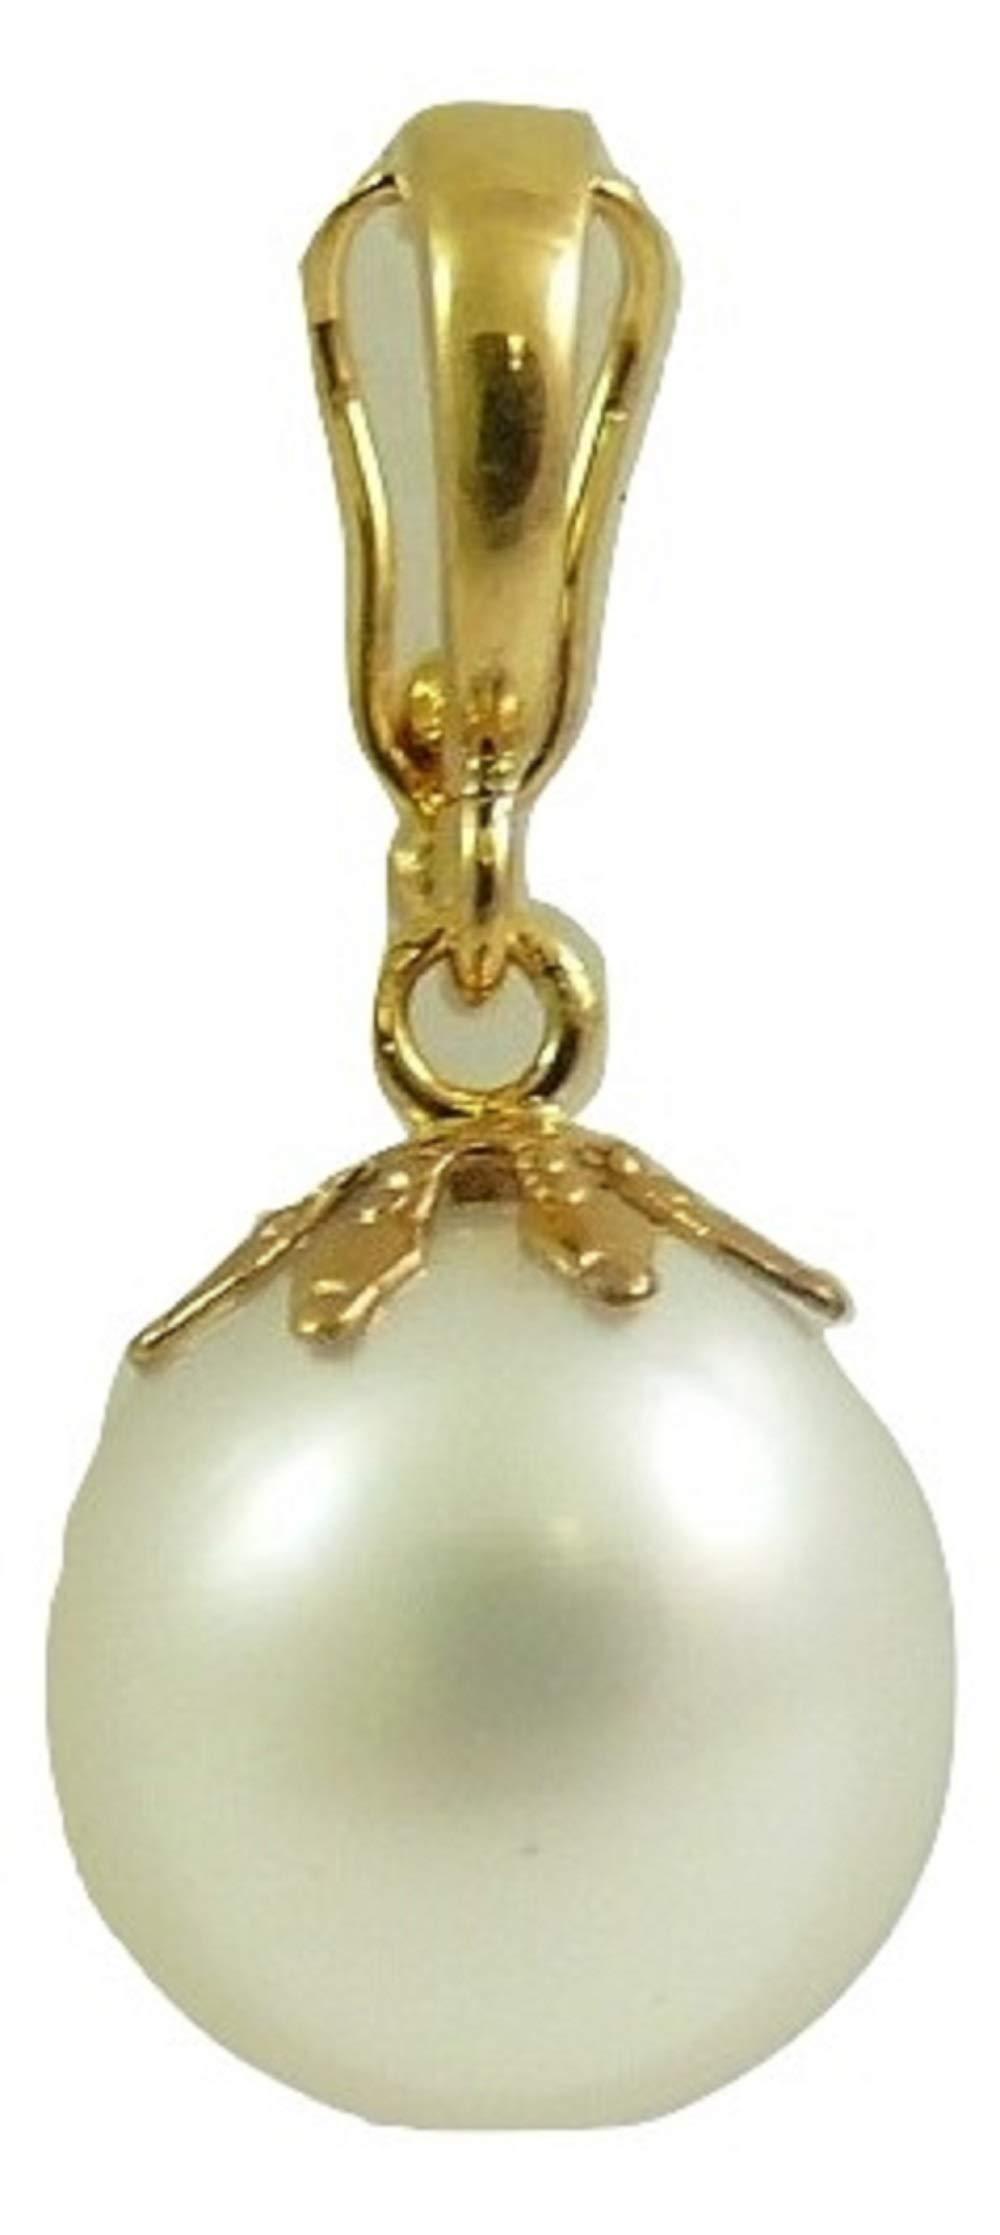 Vics Fine Jewelry South Sea White 11.1 x 11.6mm Pearl Pendant 14k Yellow Gold Enhancer